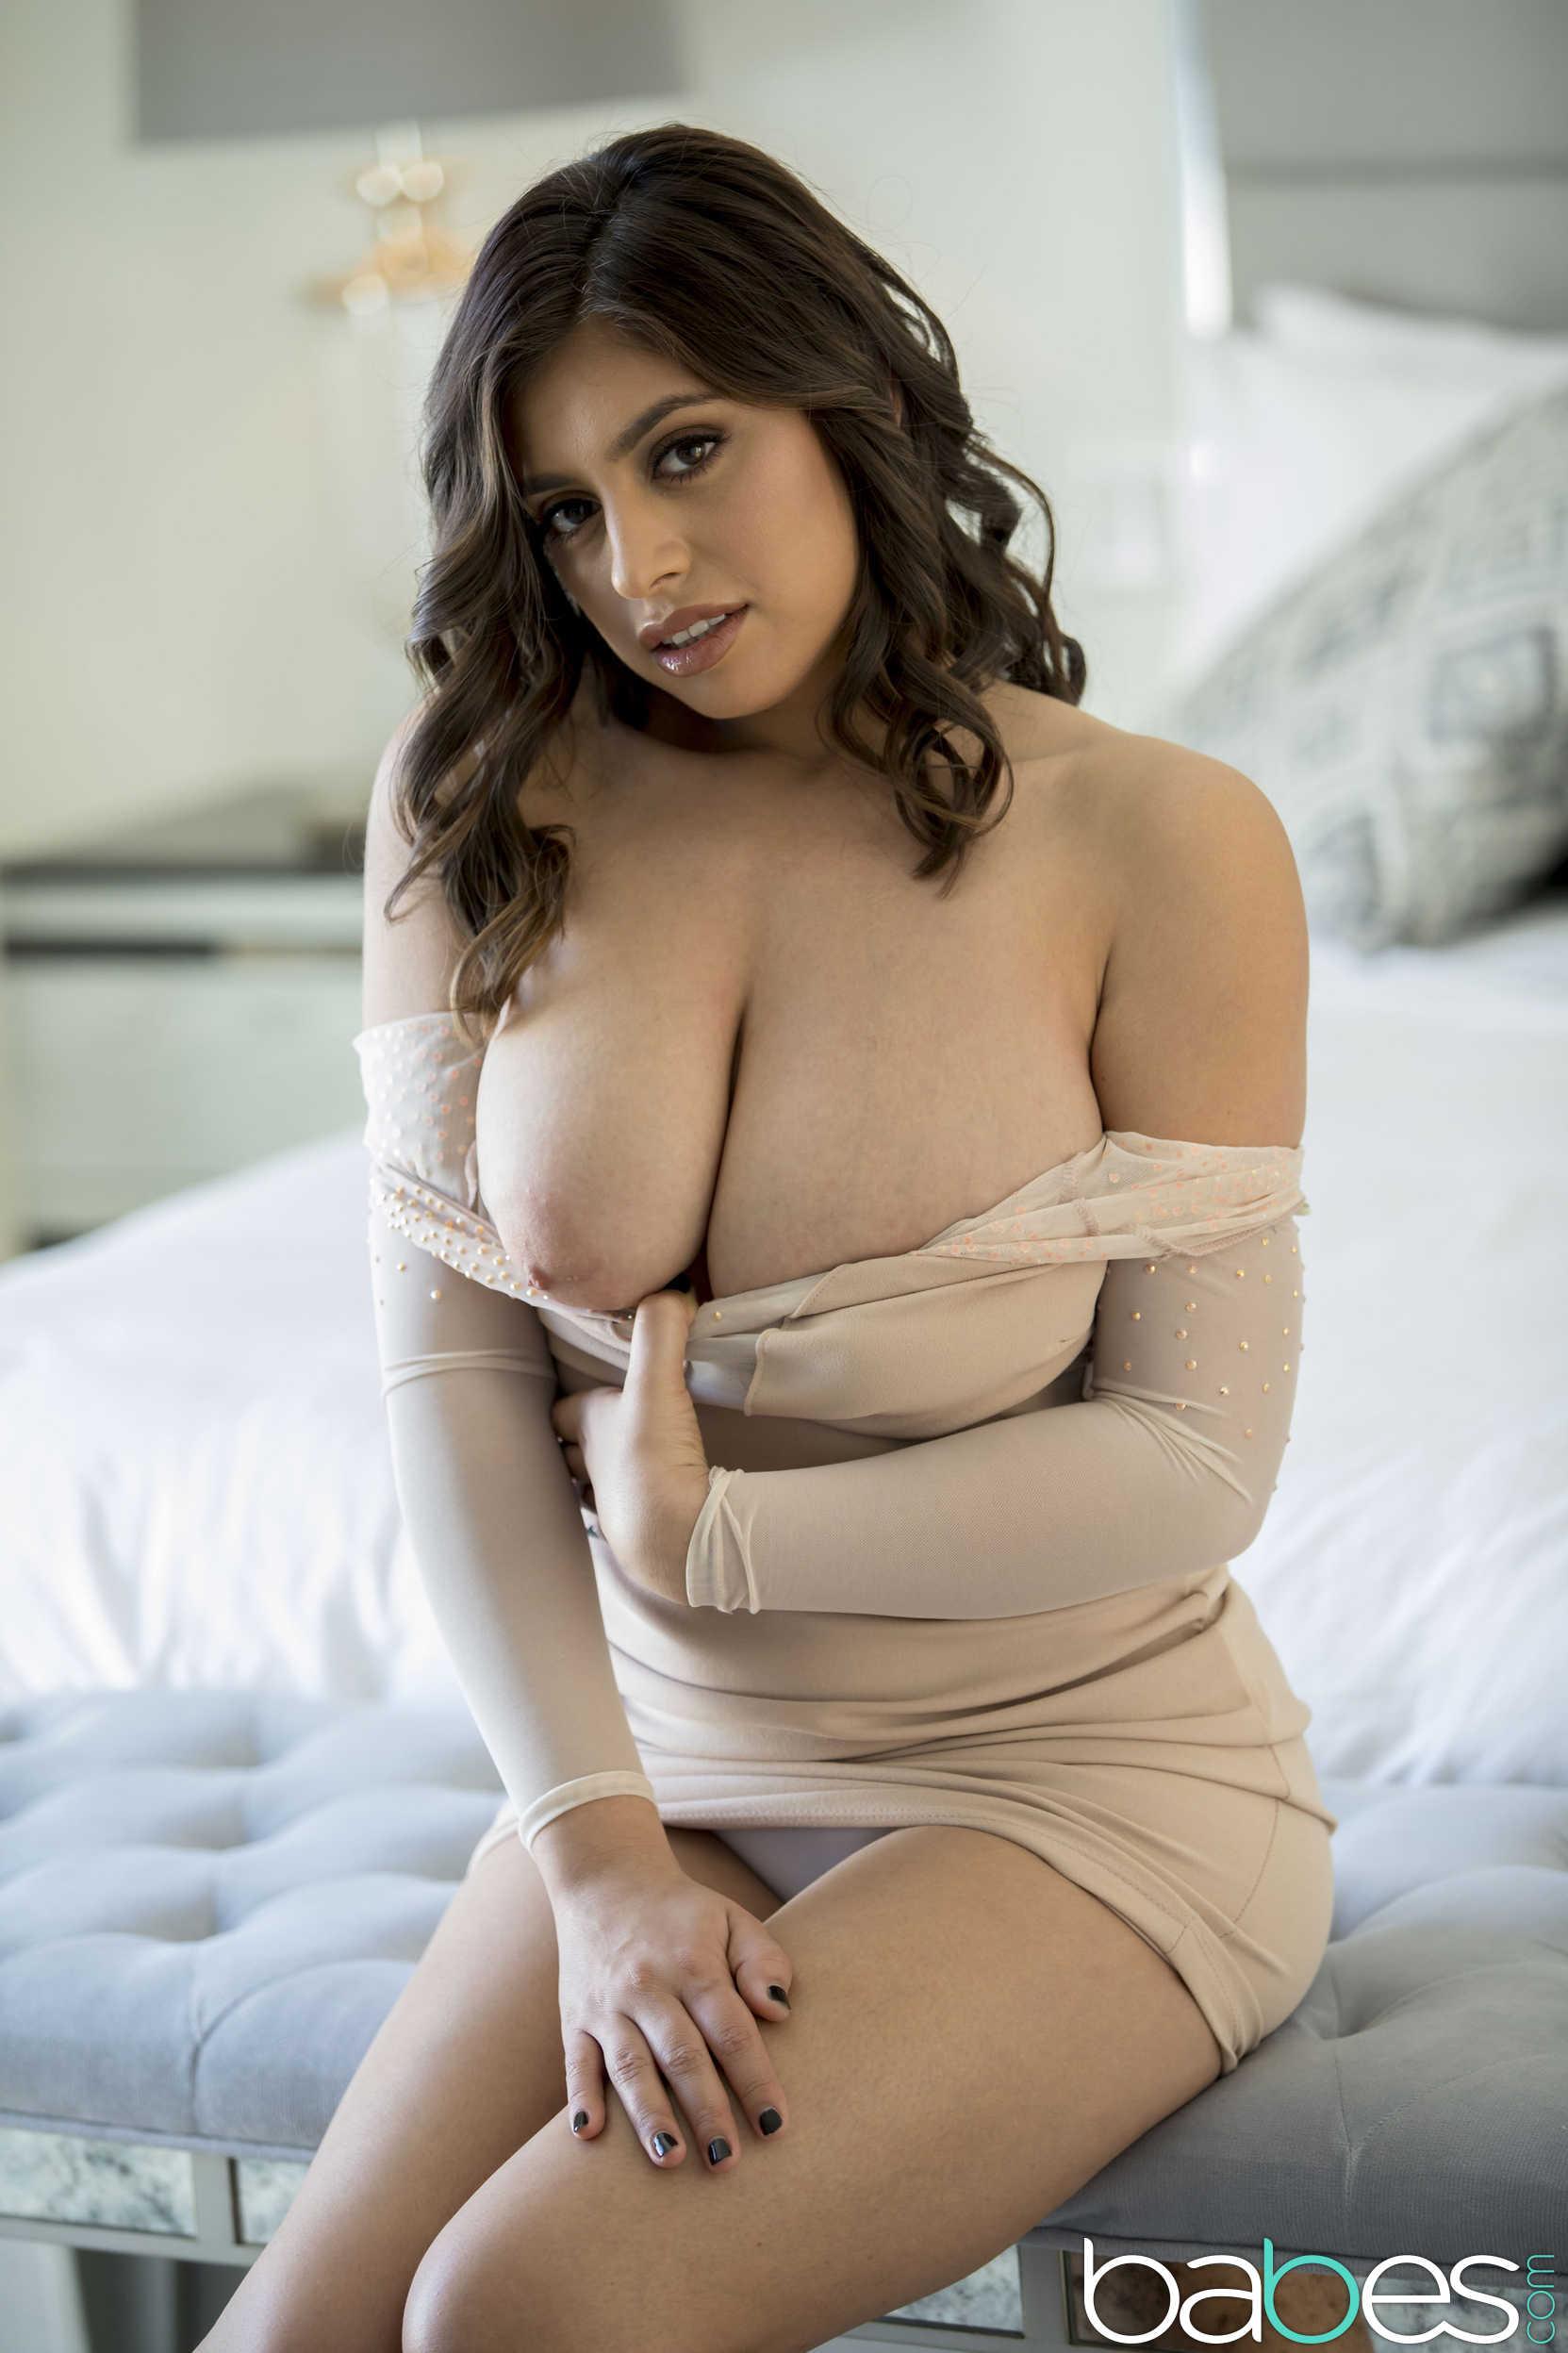 Sophiee Ann Nude Webcam Model  Curvy Erotic